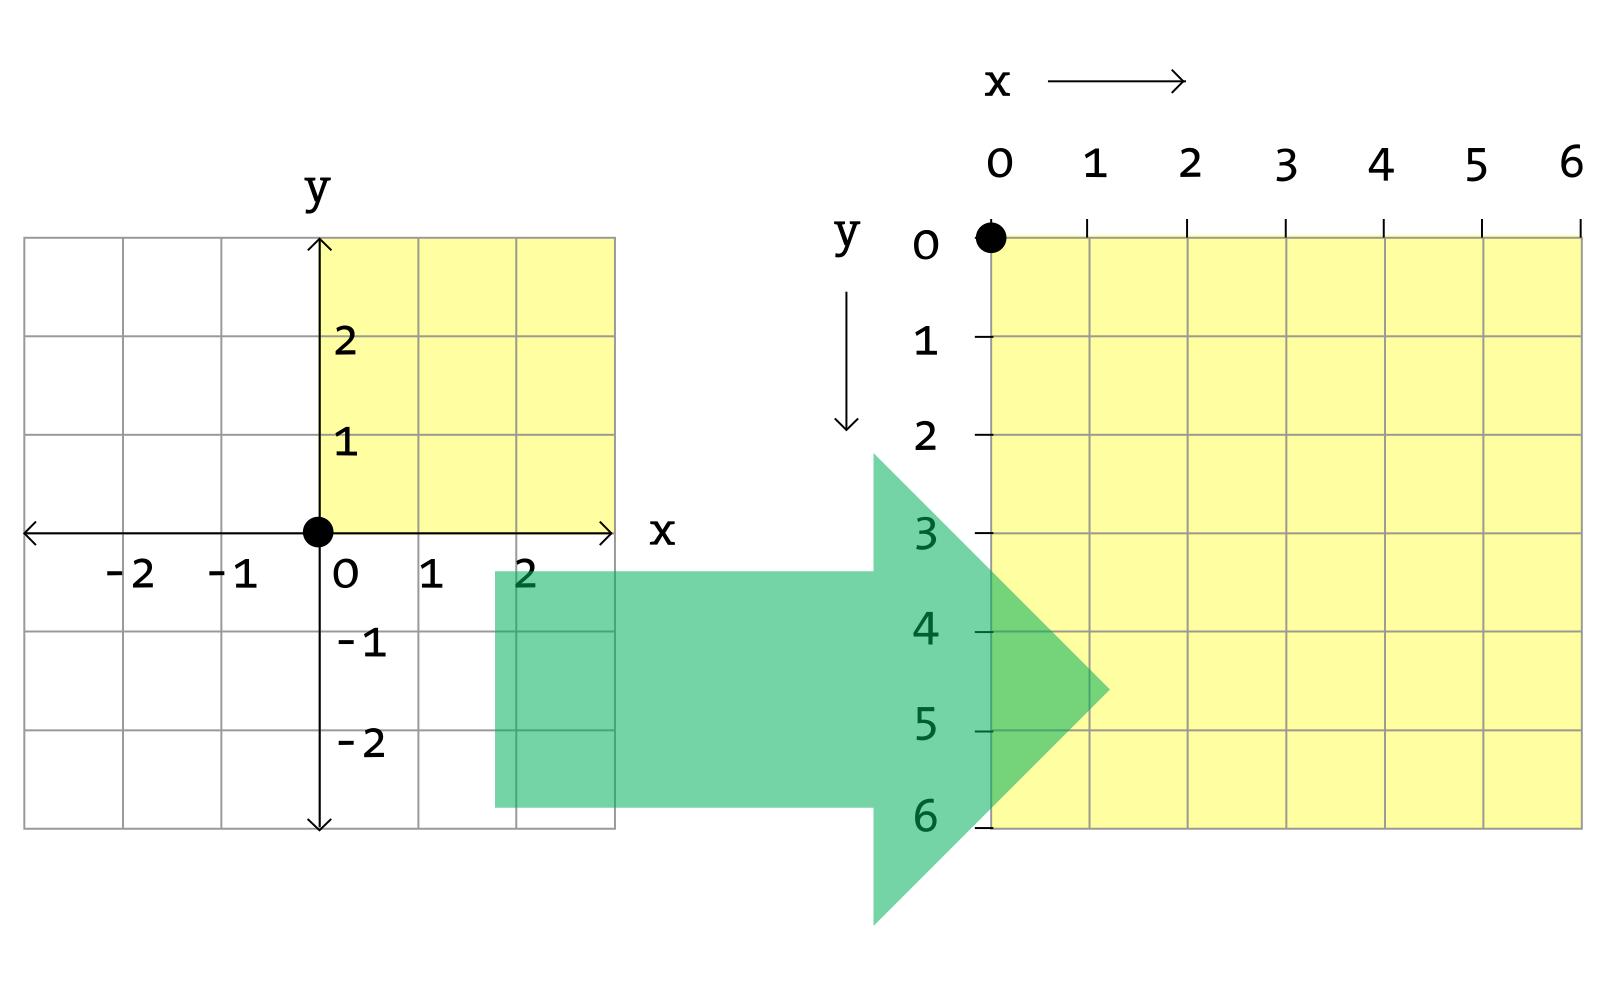 V3 (left), V4 (right)